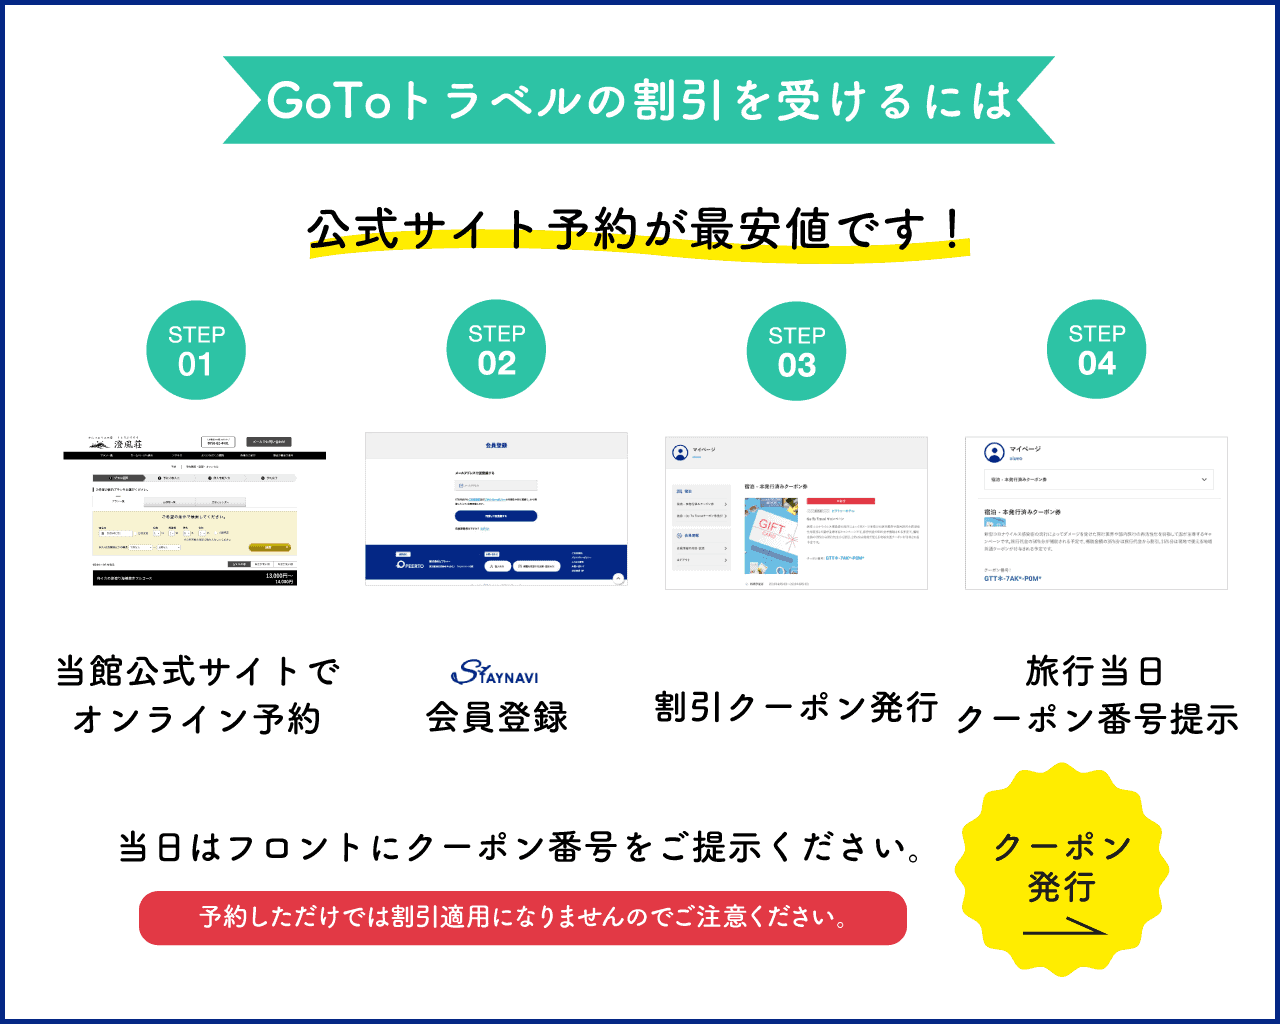 GoToキャンペーンの割引を受けるには予約完了後STAYNAVIの登録が必要です。